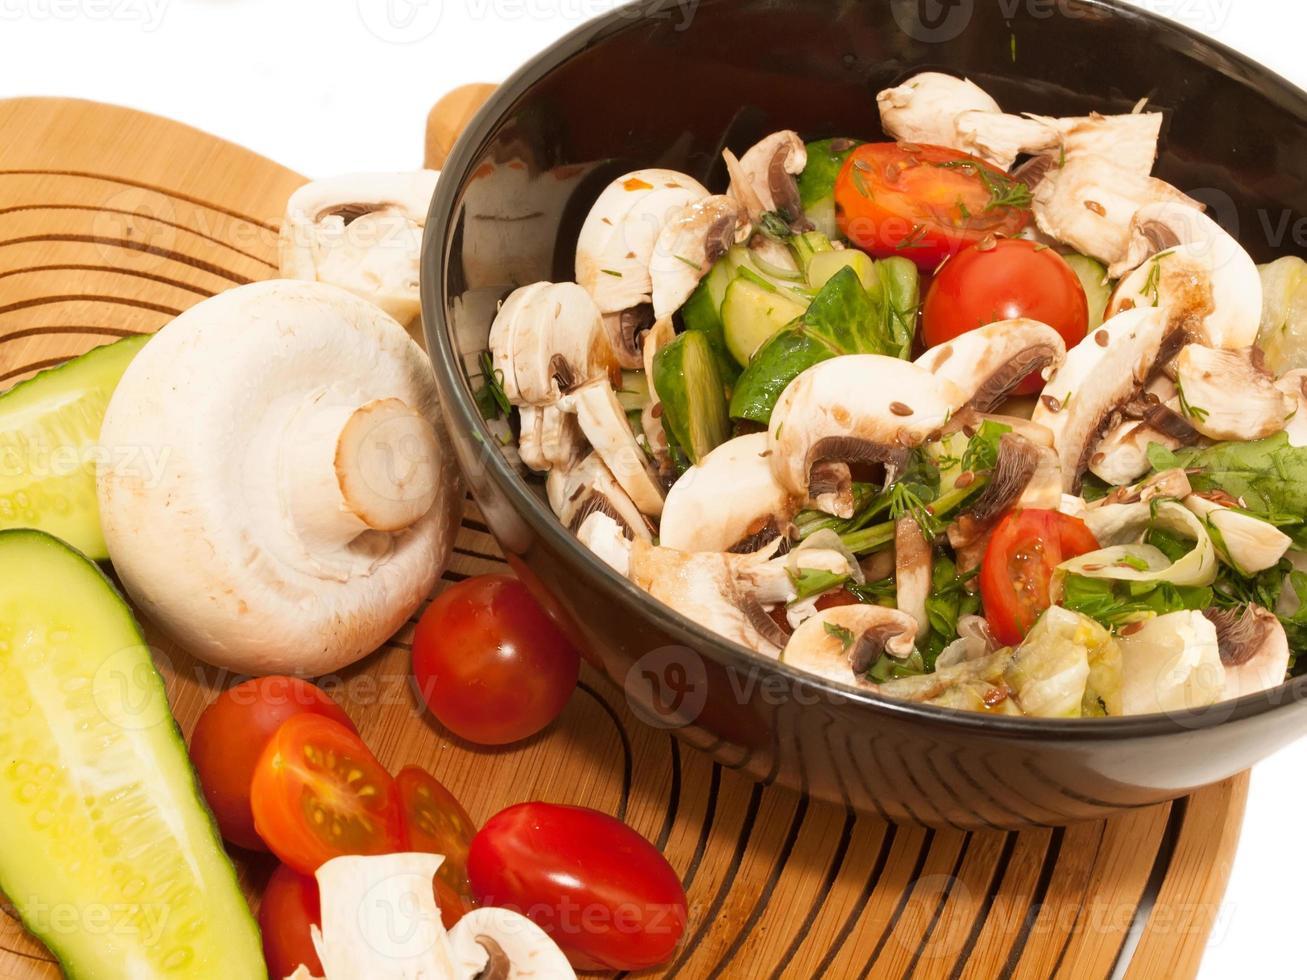 salade au champignon. photo